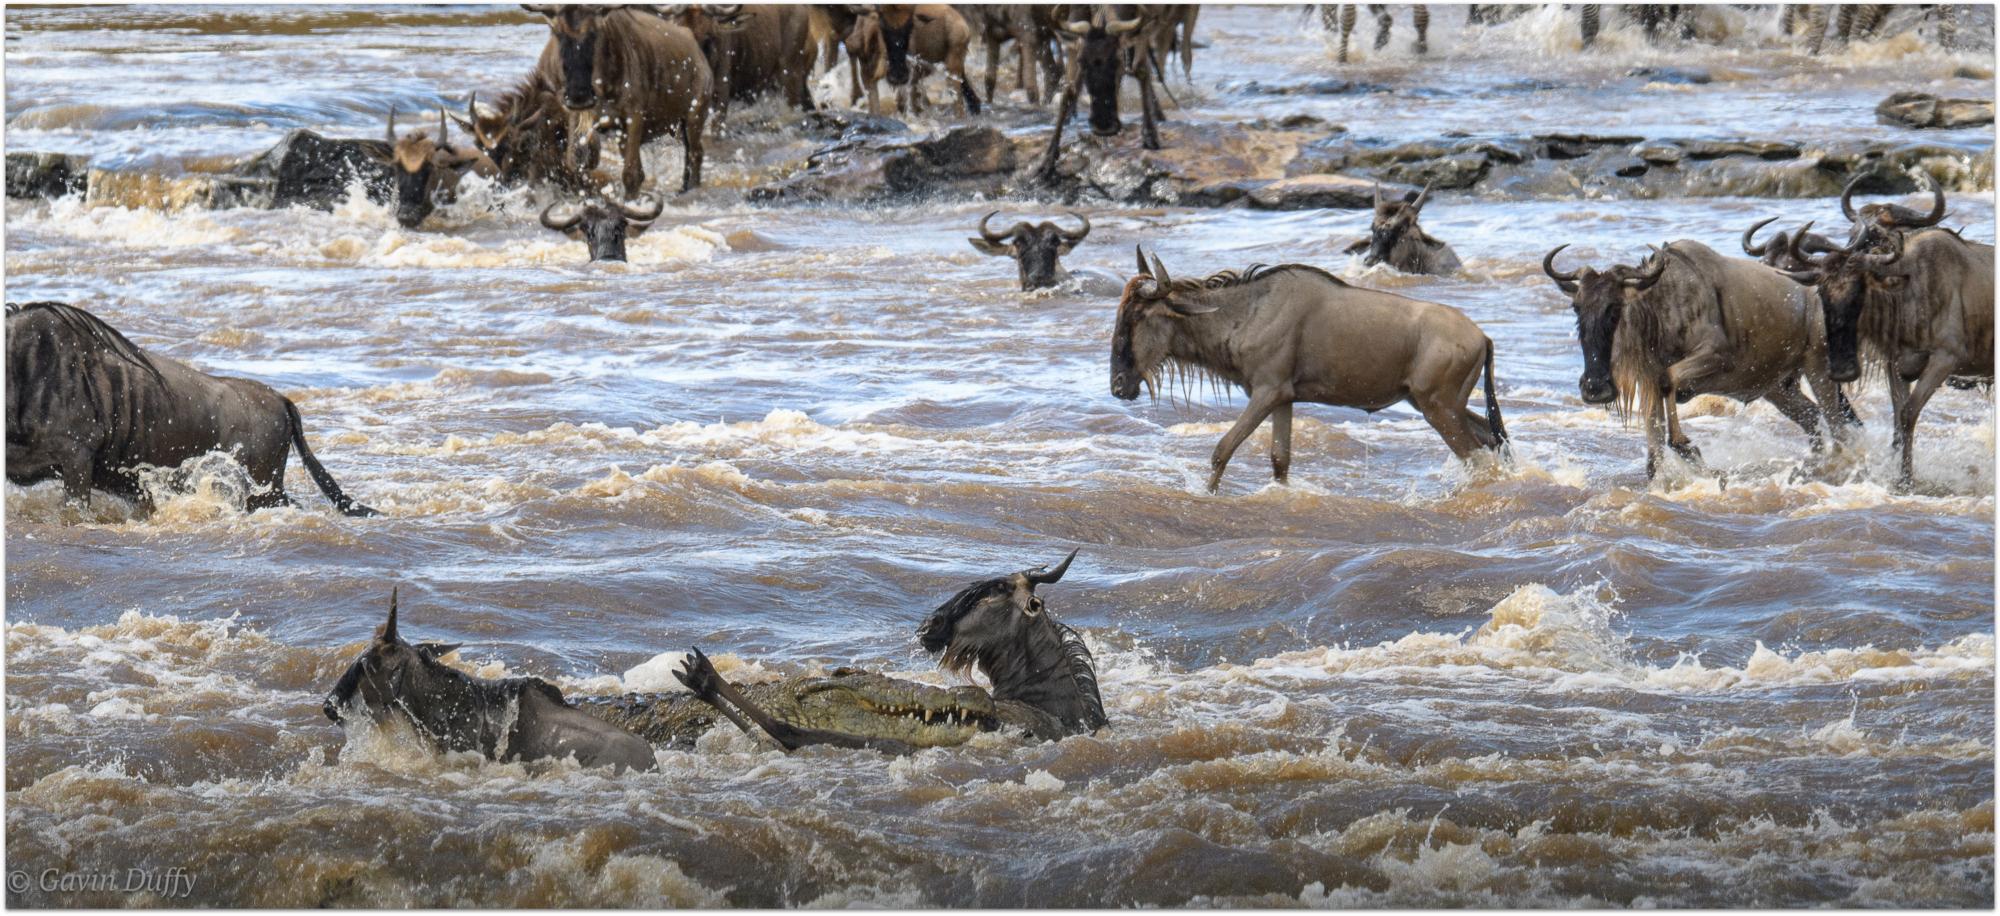 Mara River crossing casualties © Gavin Duffy